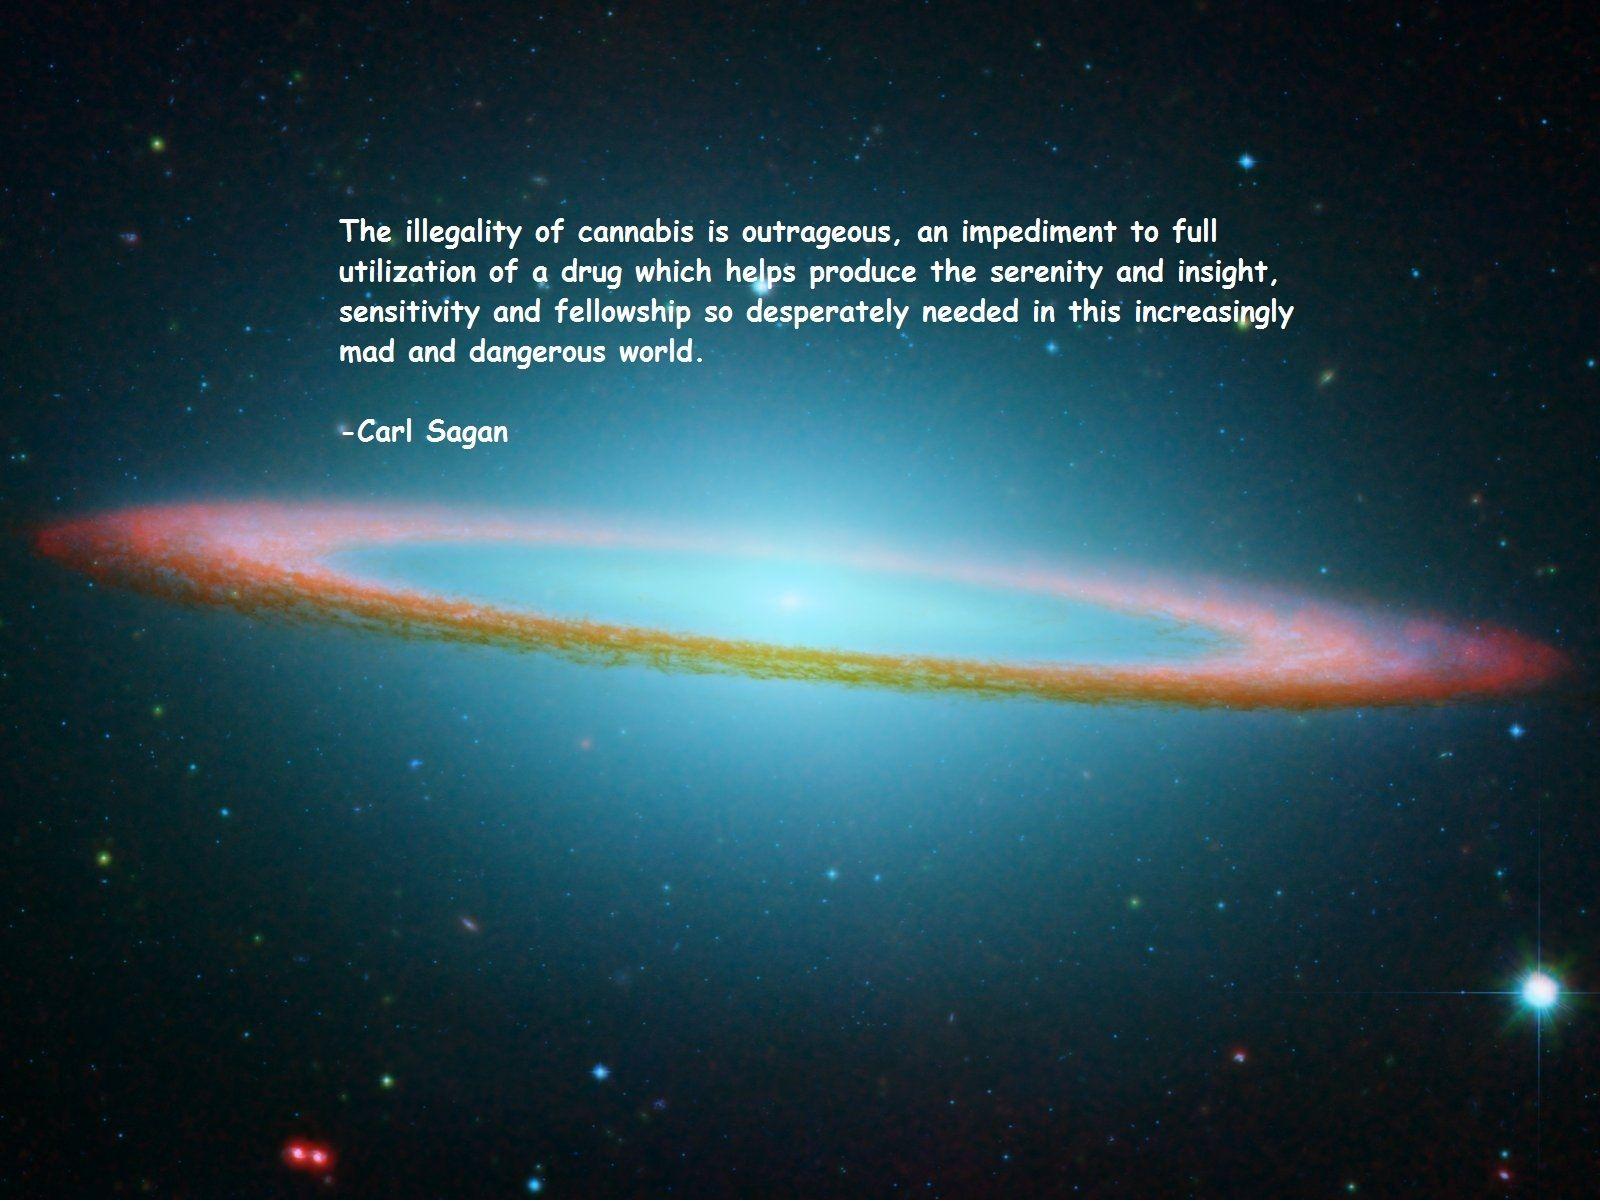 Quotes Carl Sagan Marijuana Sombrero Galaxy Text #quotes